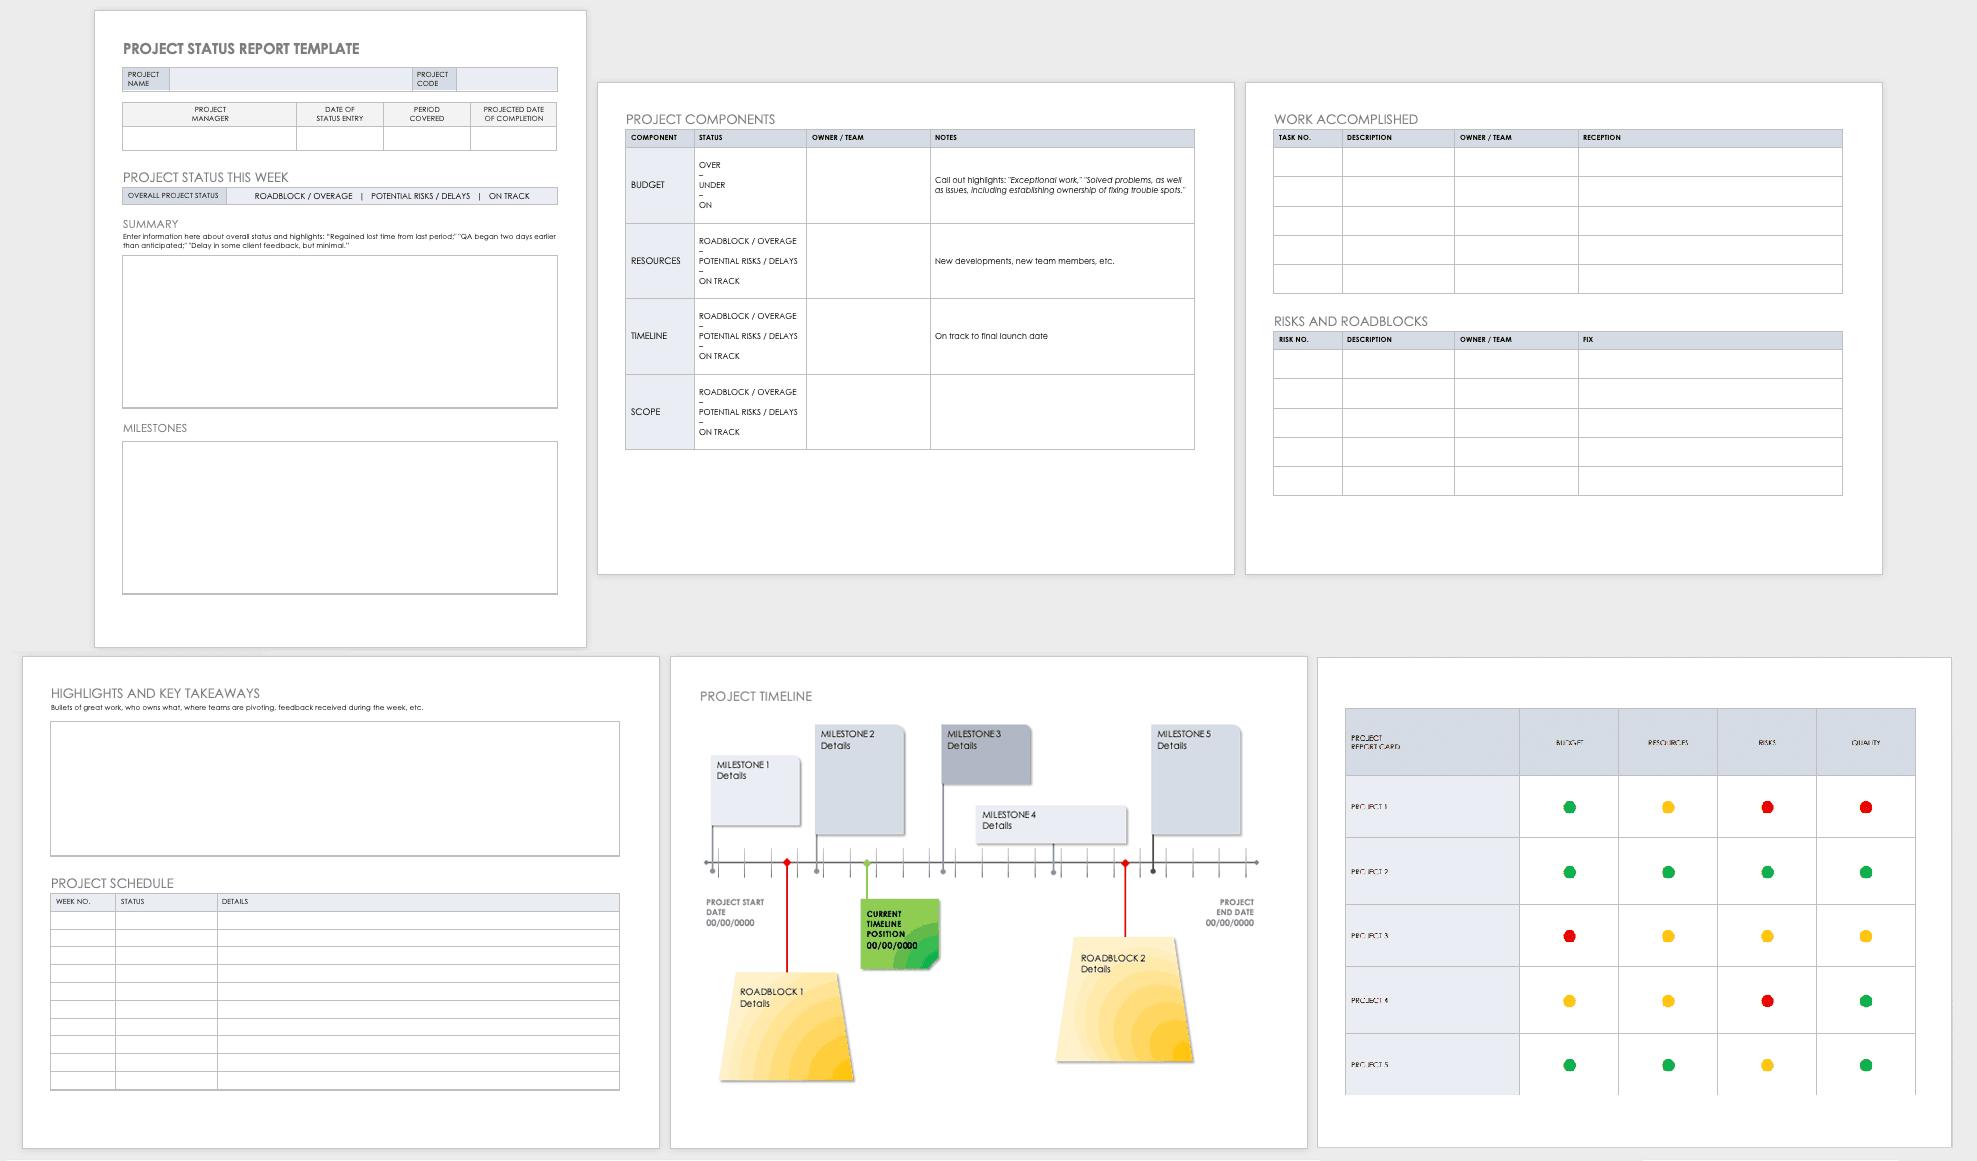 Free Project Report Templates | Smartsheet Pertaining To Ms Word Templates For Project Report